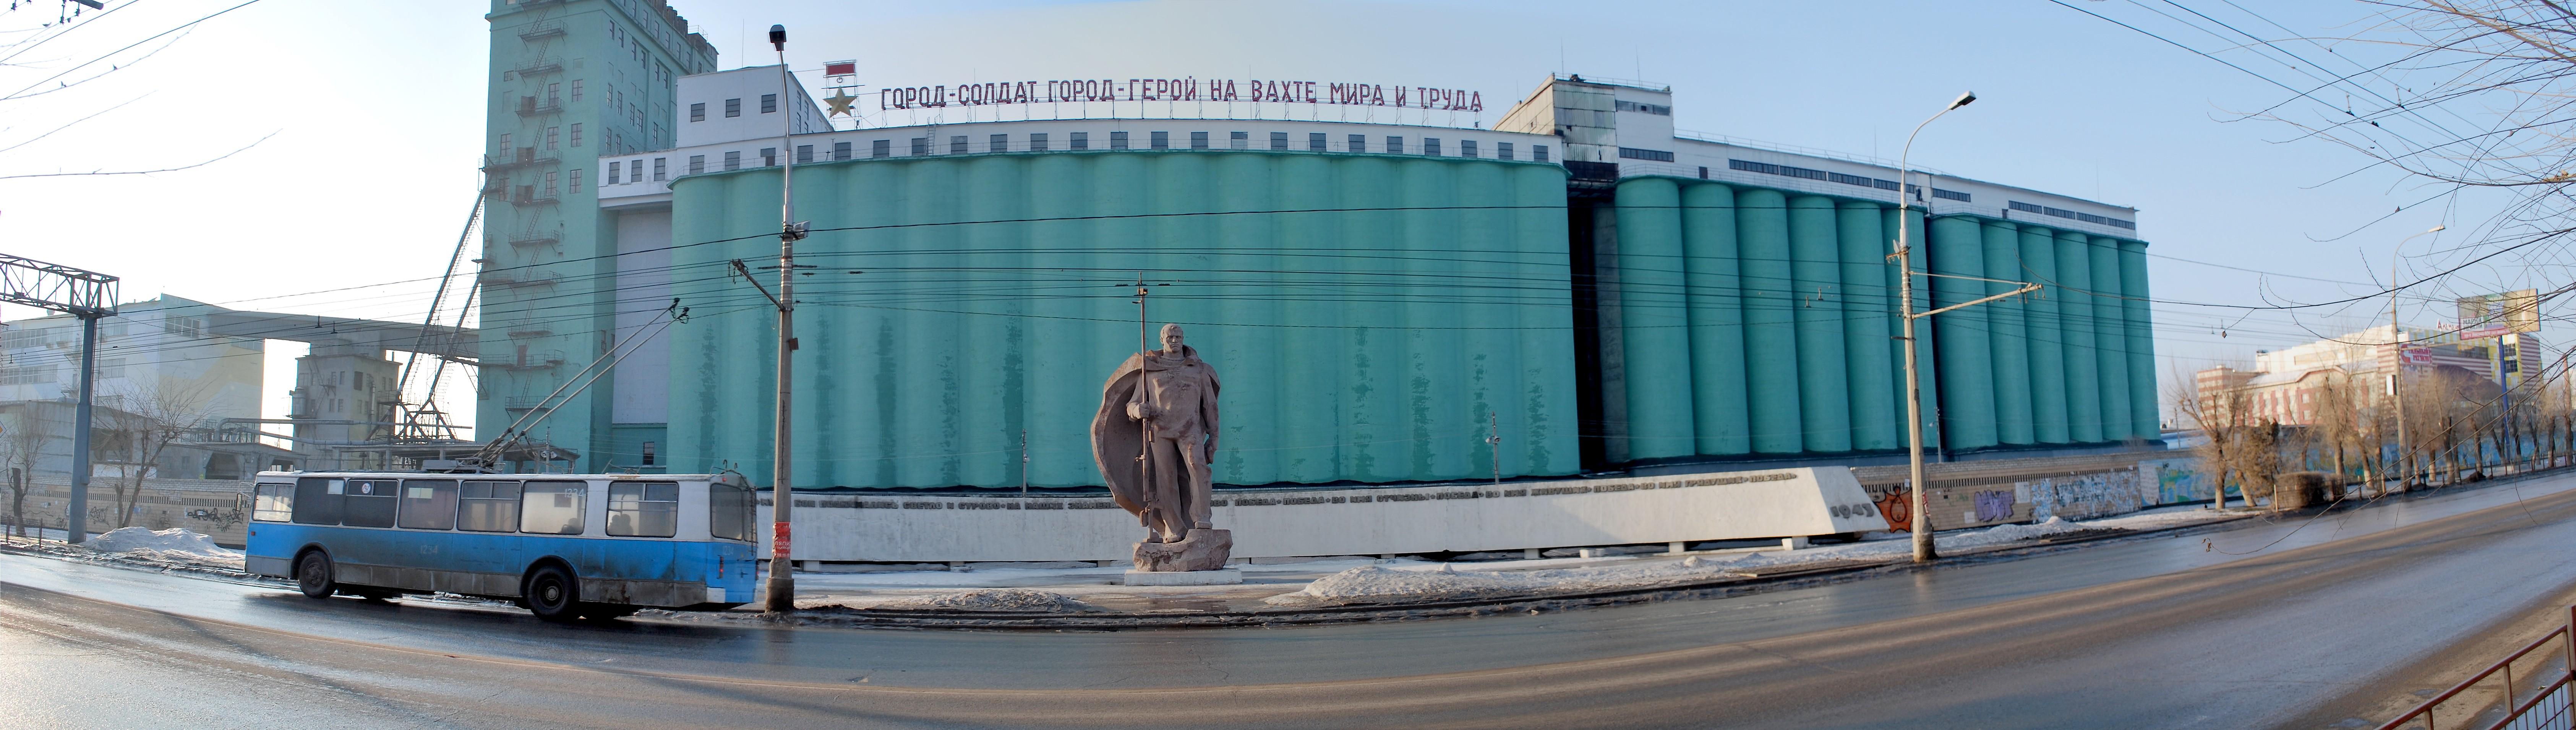 элеватор волгоградская